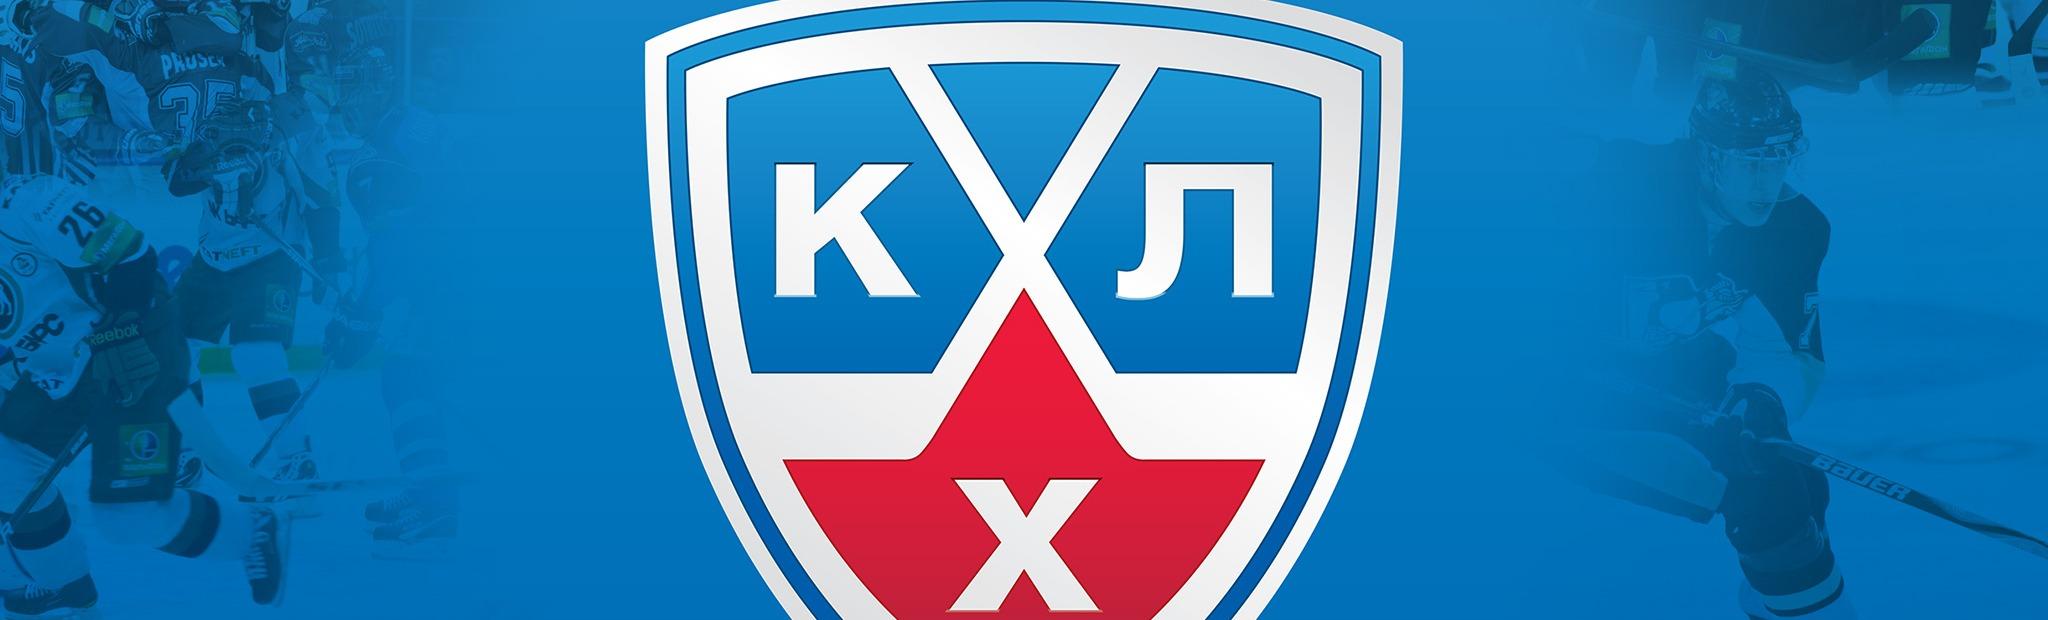 Матч КХЛ ЦСКА - Авангард